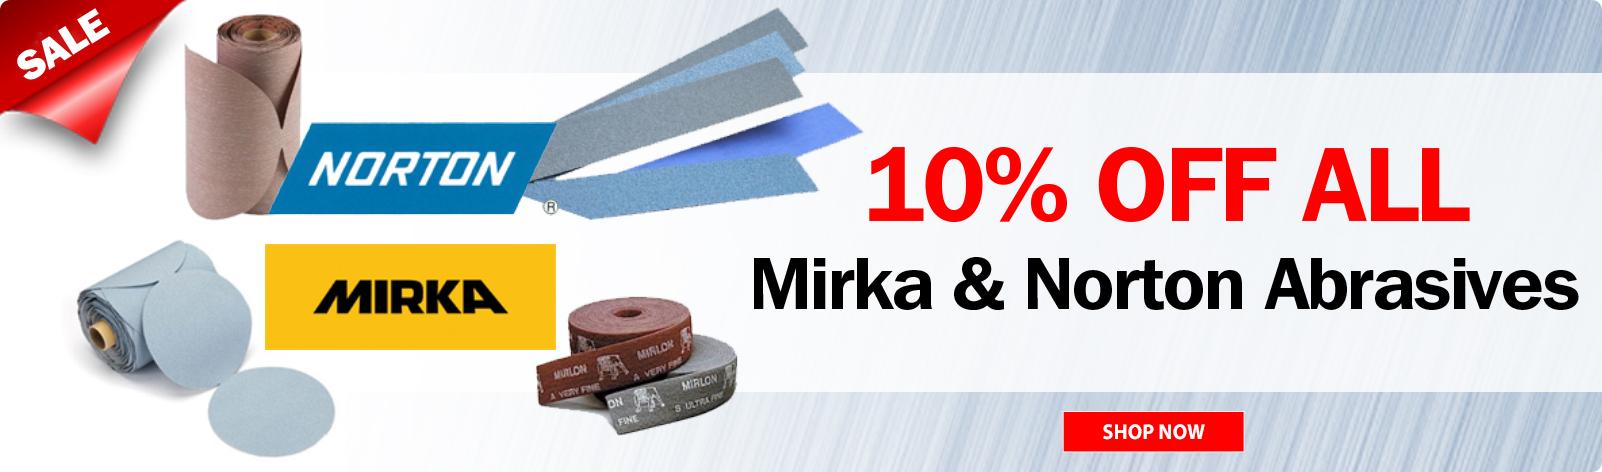 10% Off Norton-Mirka Abrasives!